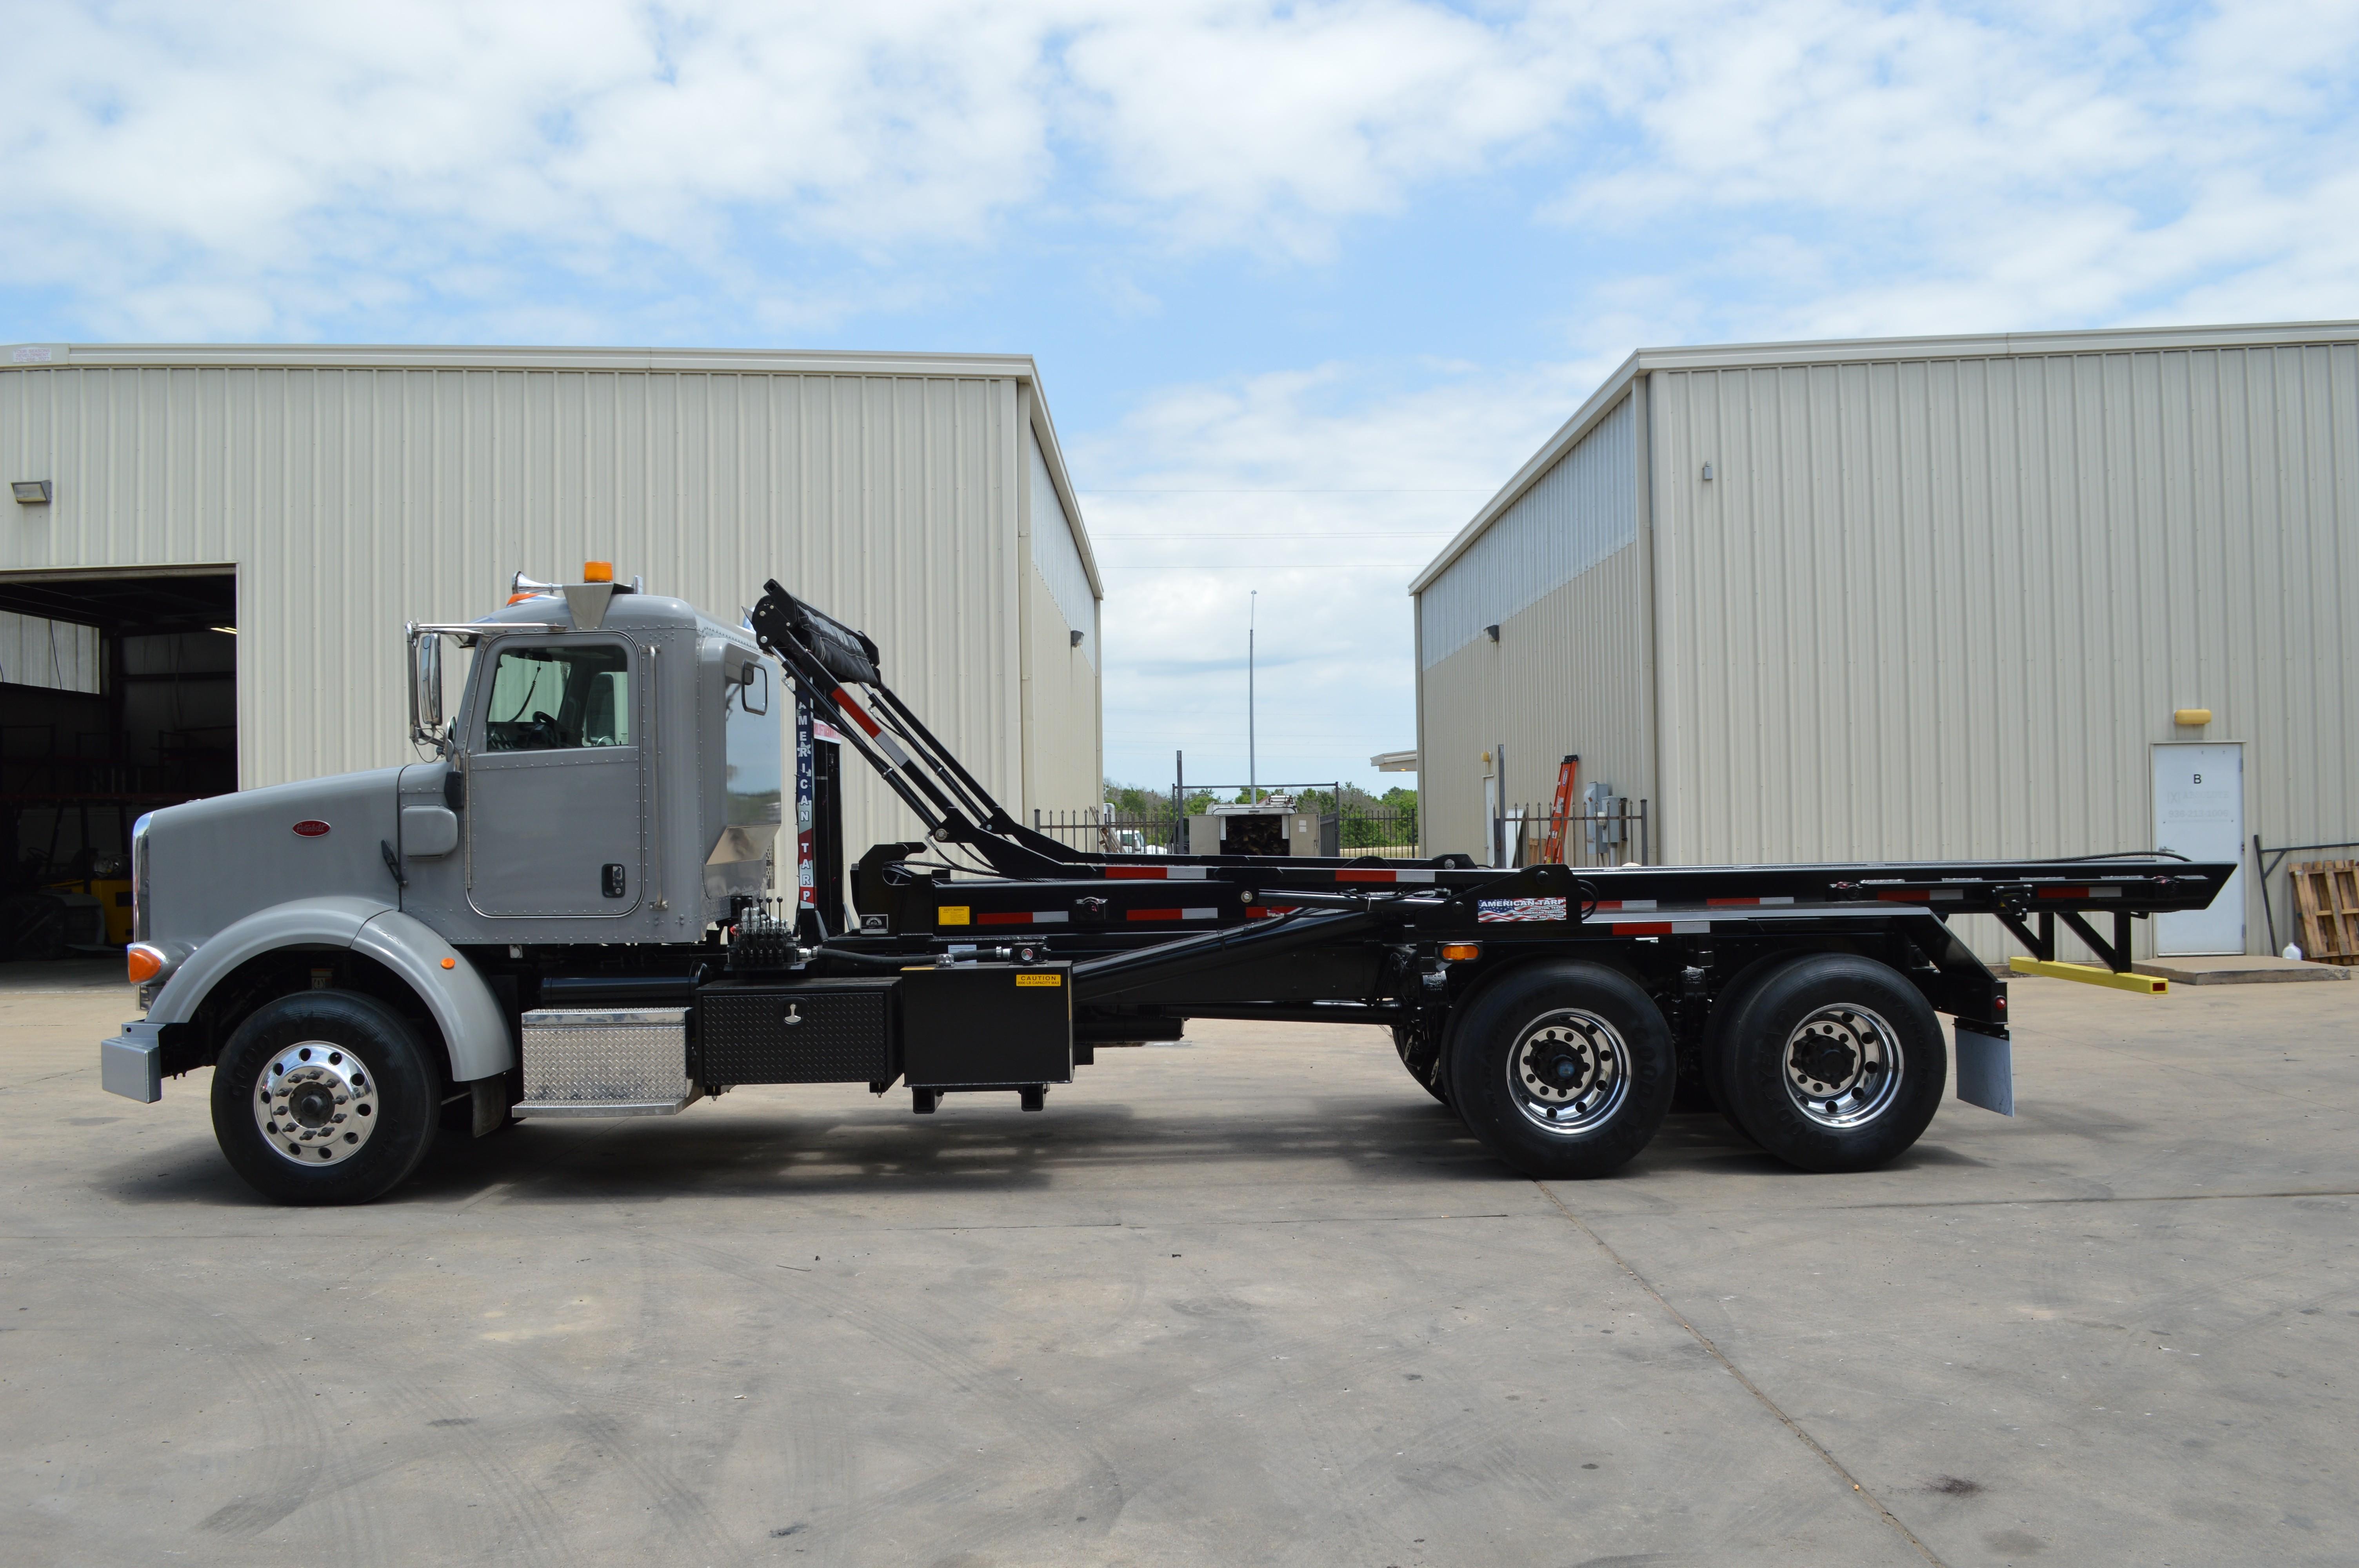 Used, 2015, Peterbilt, 365 Roll Off ( Several Available, Brand new american hoist & american tarp), Transfer Trucks